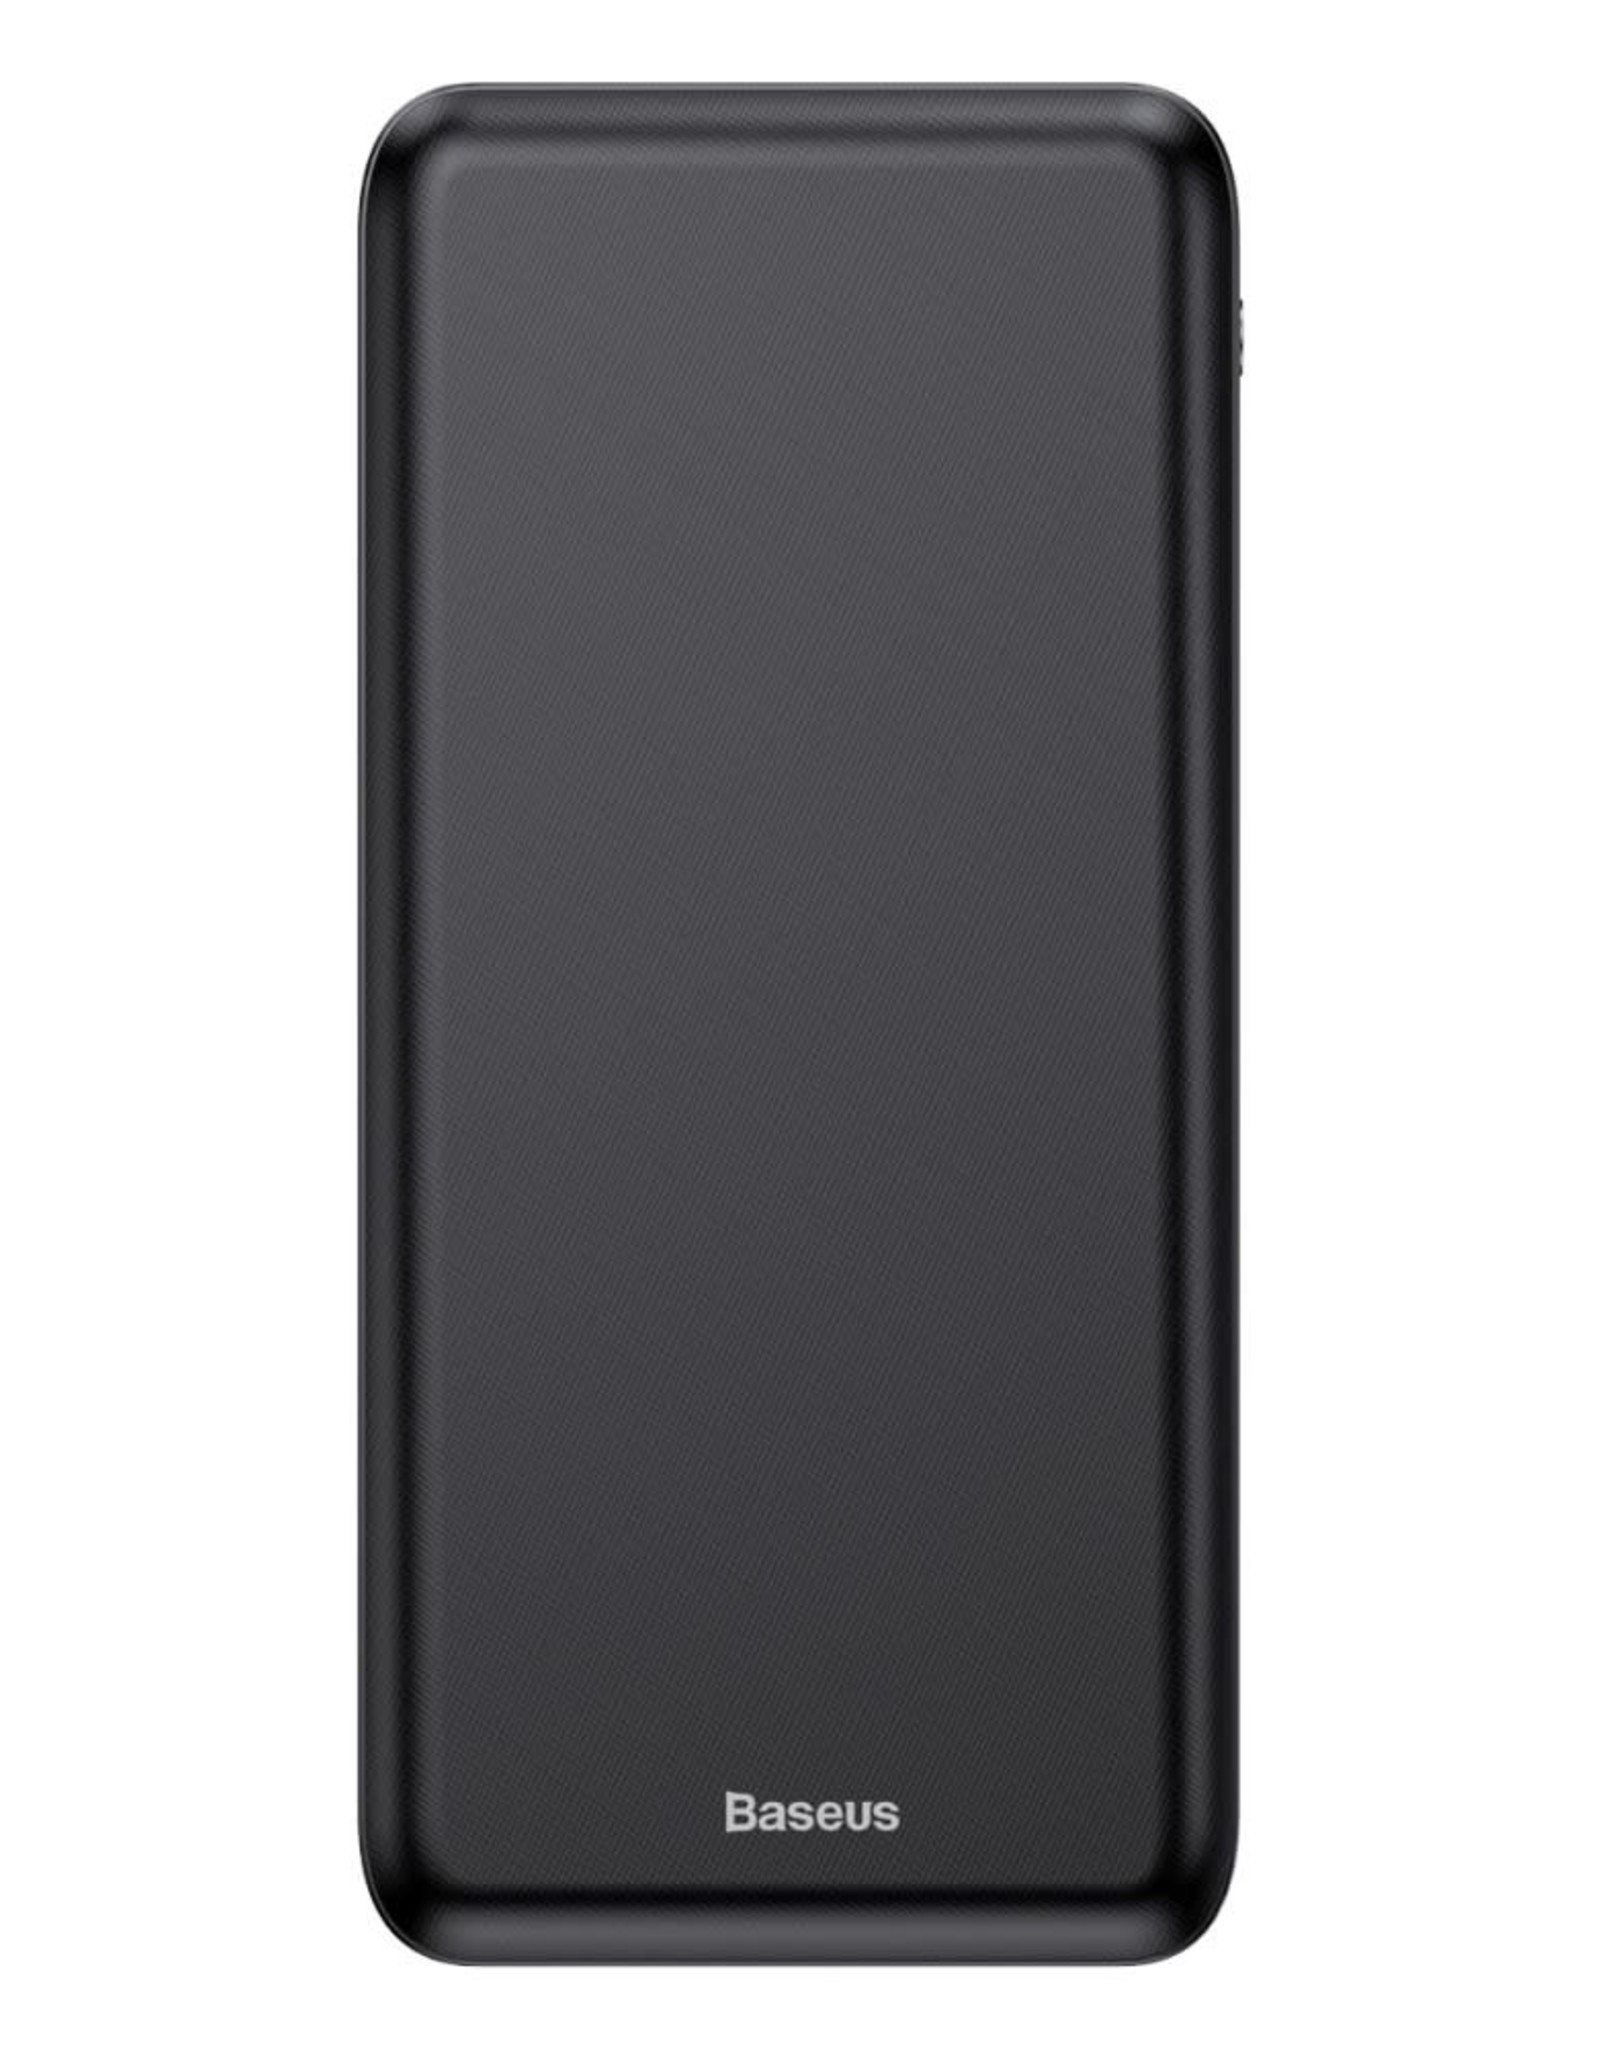 Baseus Baseus M36 Power Bank &  Wireless Charger 10000 mAh